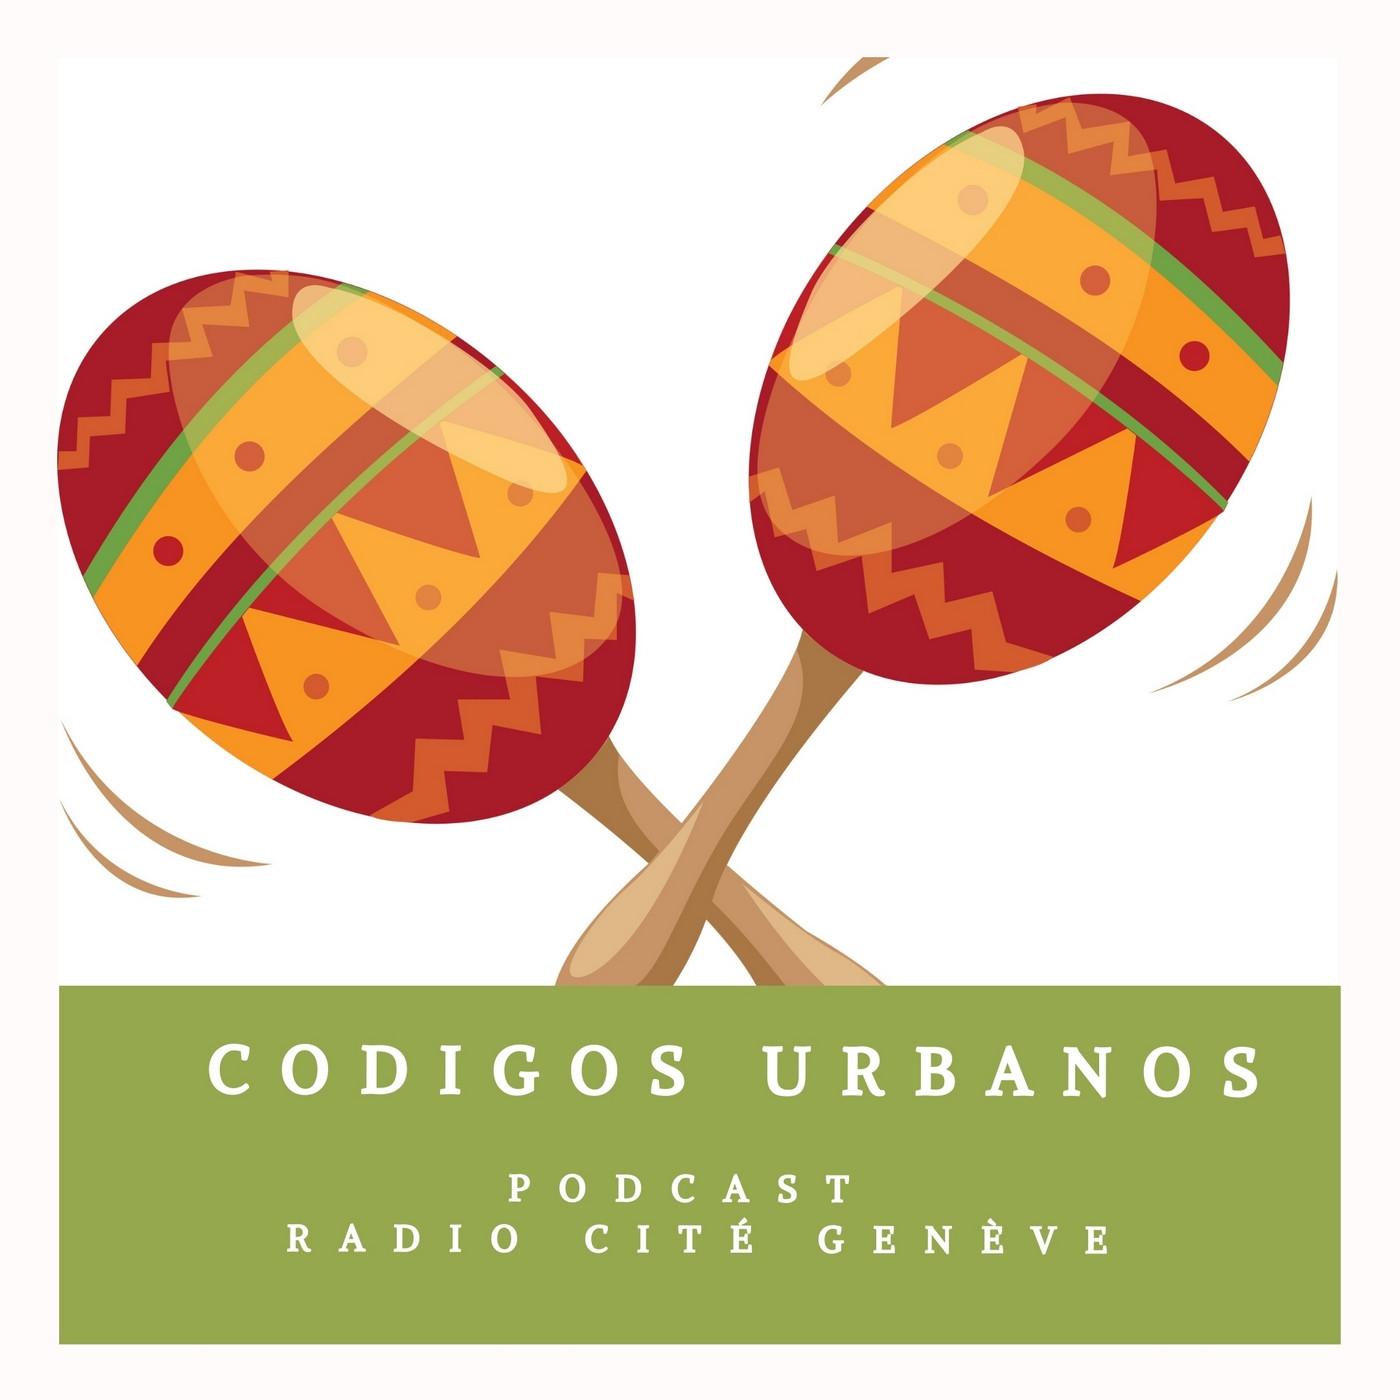 Codigos Urbanos - 01/09/20